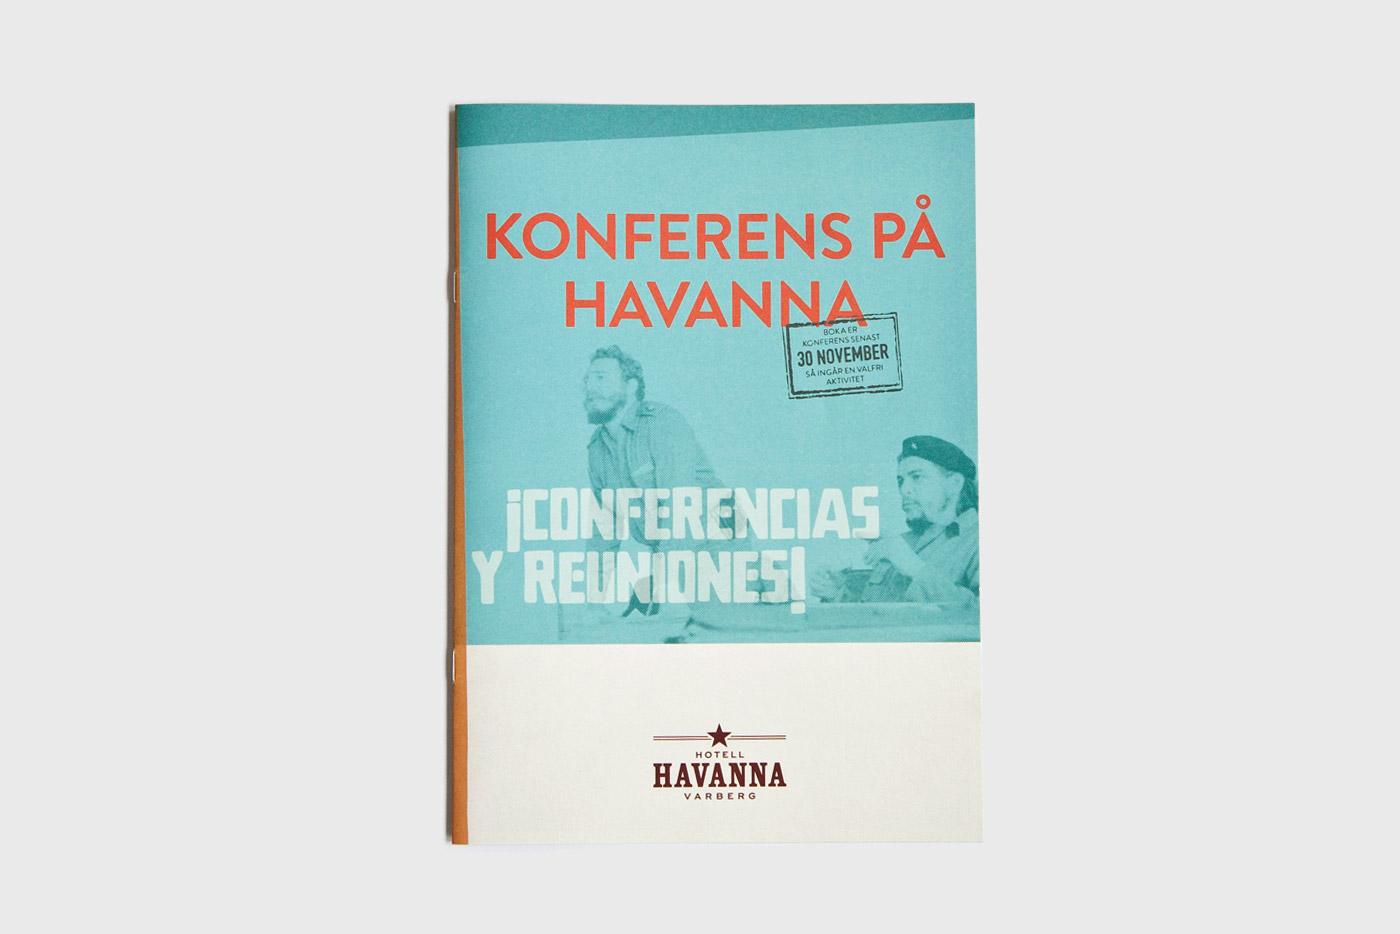 Hotell Havanna Konferens Frontpage